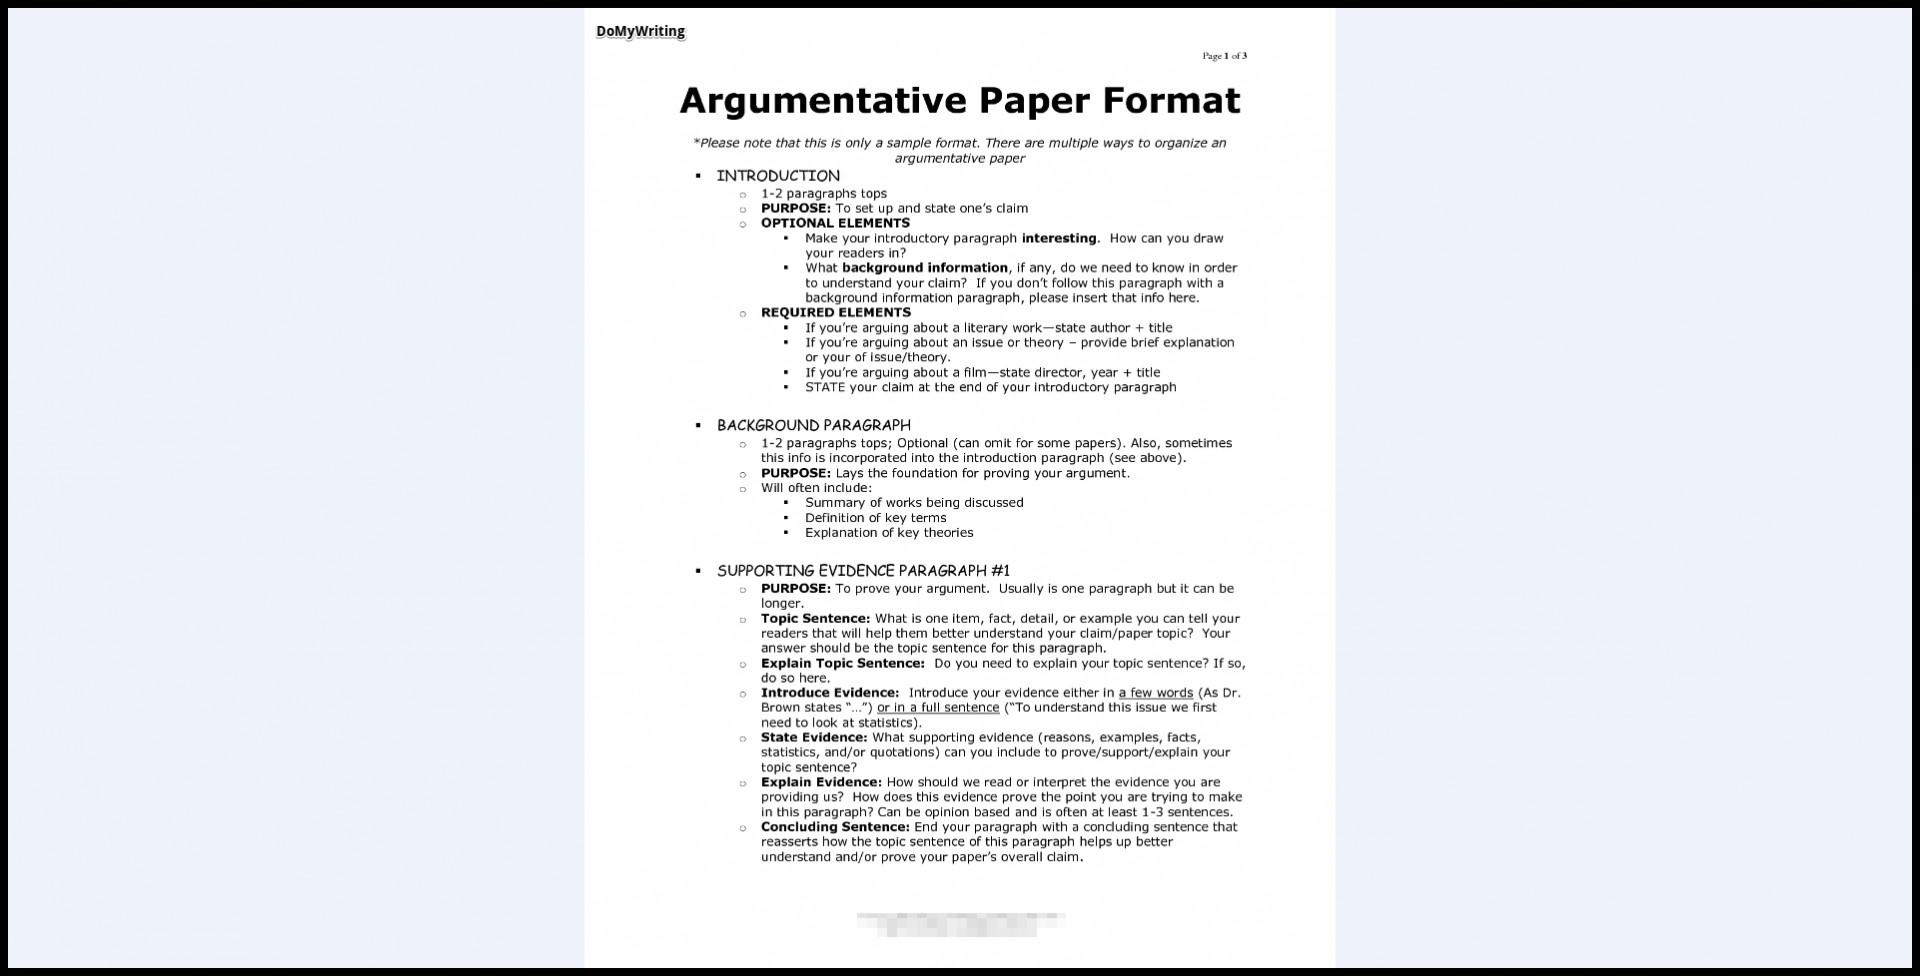 007 Argumentative Essay Format Argument Wonderful Outline Examples Template Pdf Writing Middle School 1920